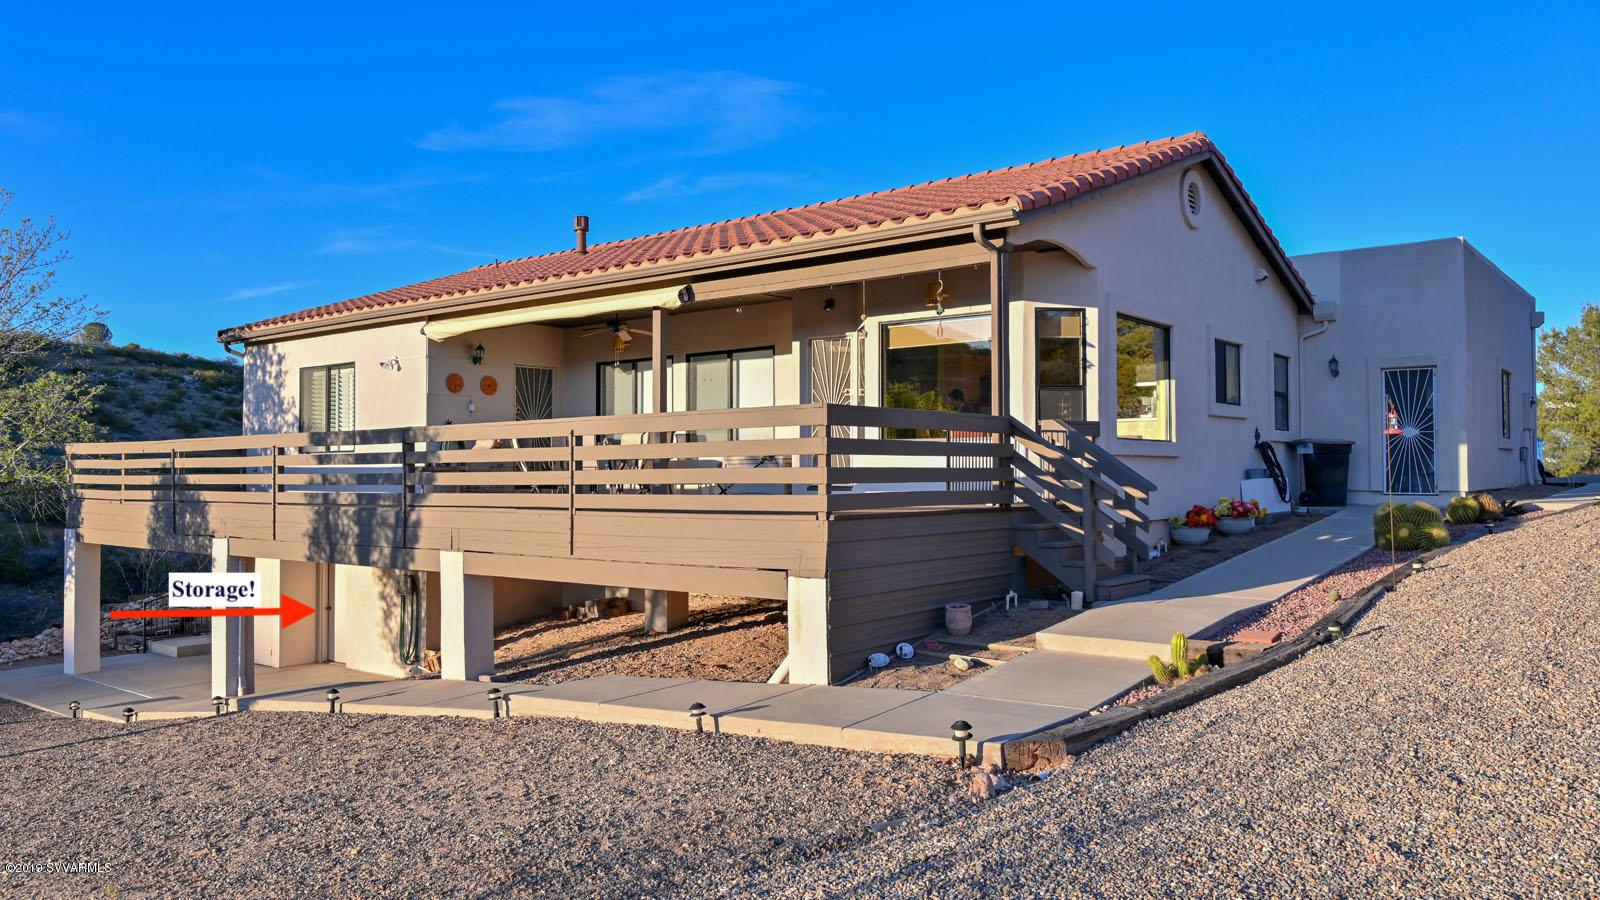 11600 Plateau Rd Cornville, AZ 86325